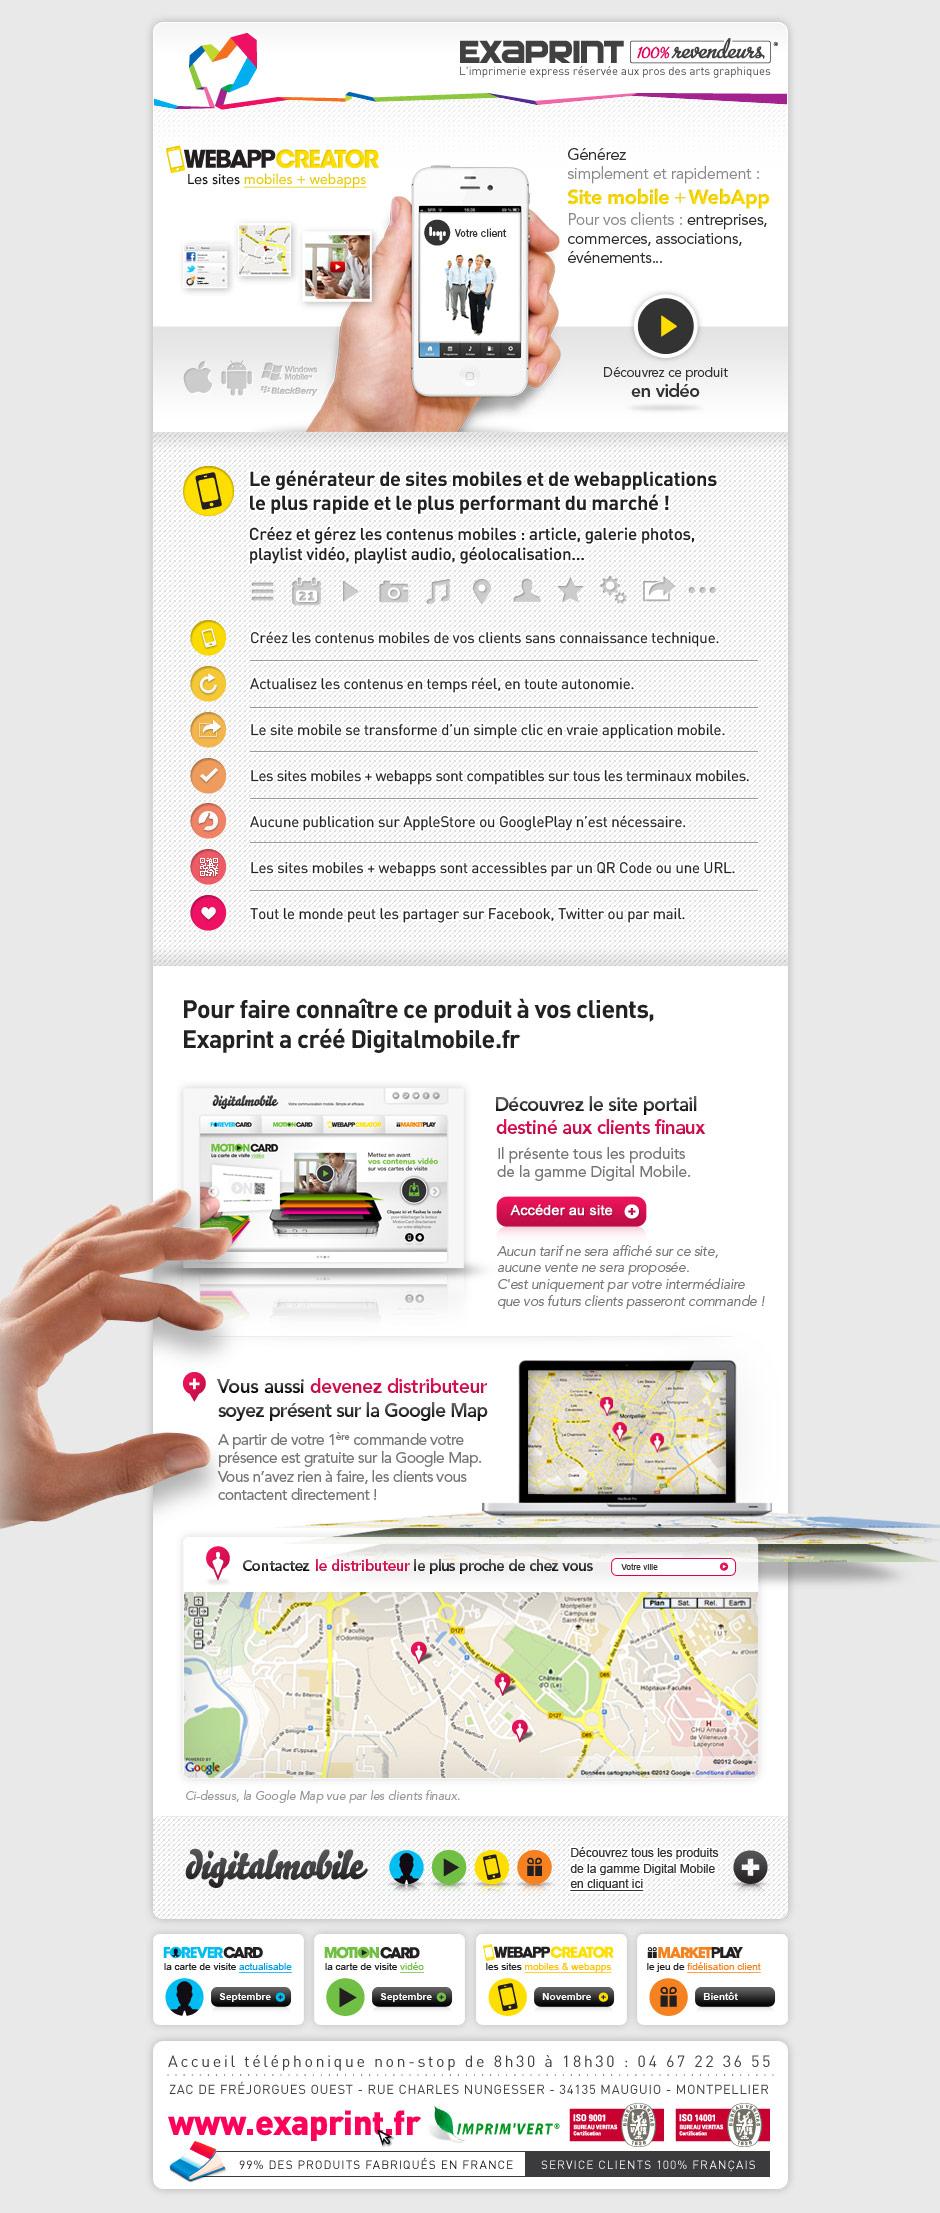 graphiste-montpellier-creation-exaprint-webappcreator-agence-communication-montpellier-caconcept-alexis-cretin-3